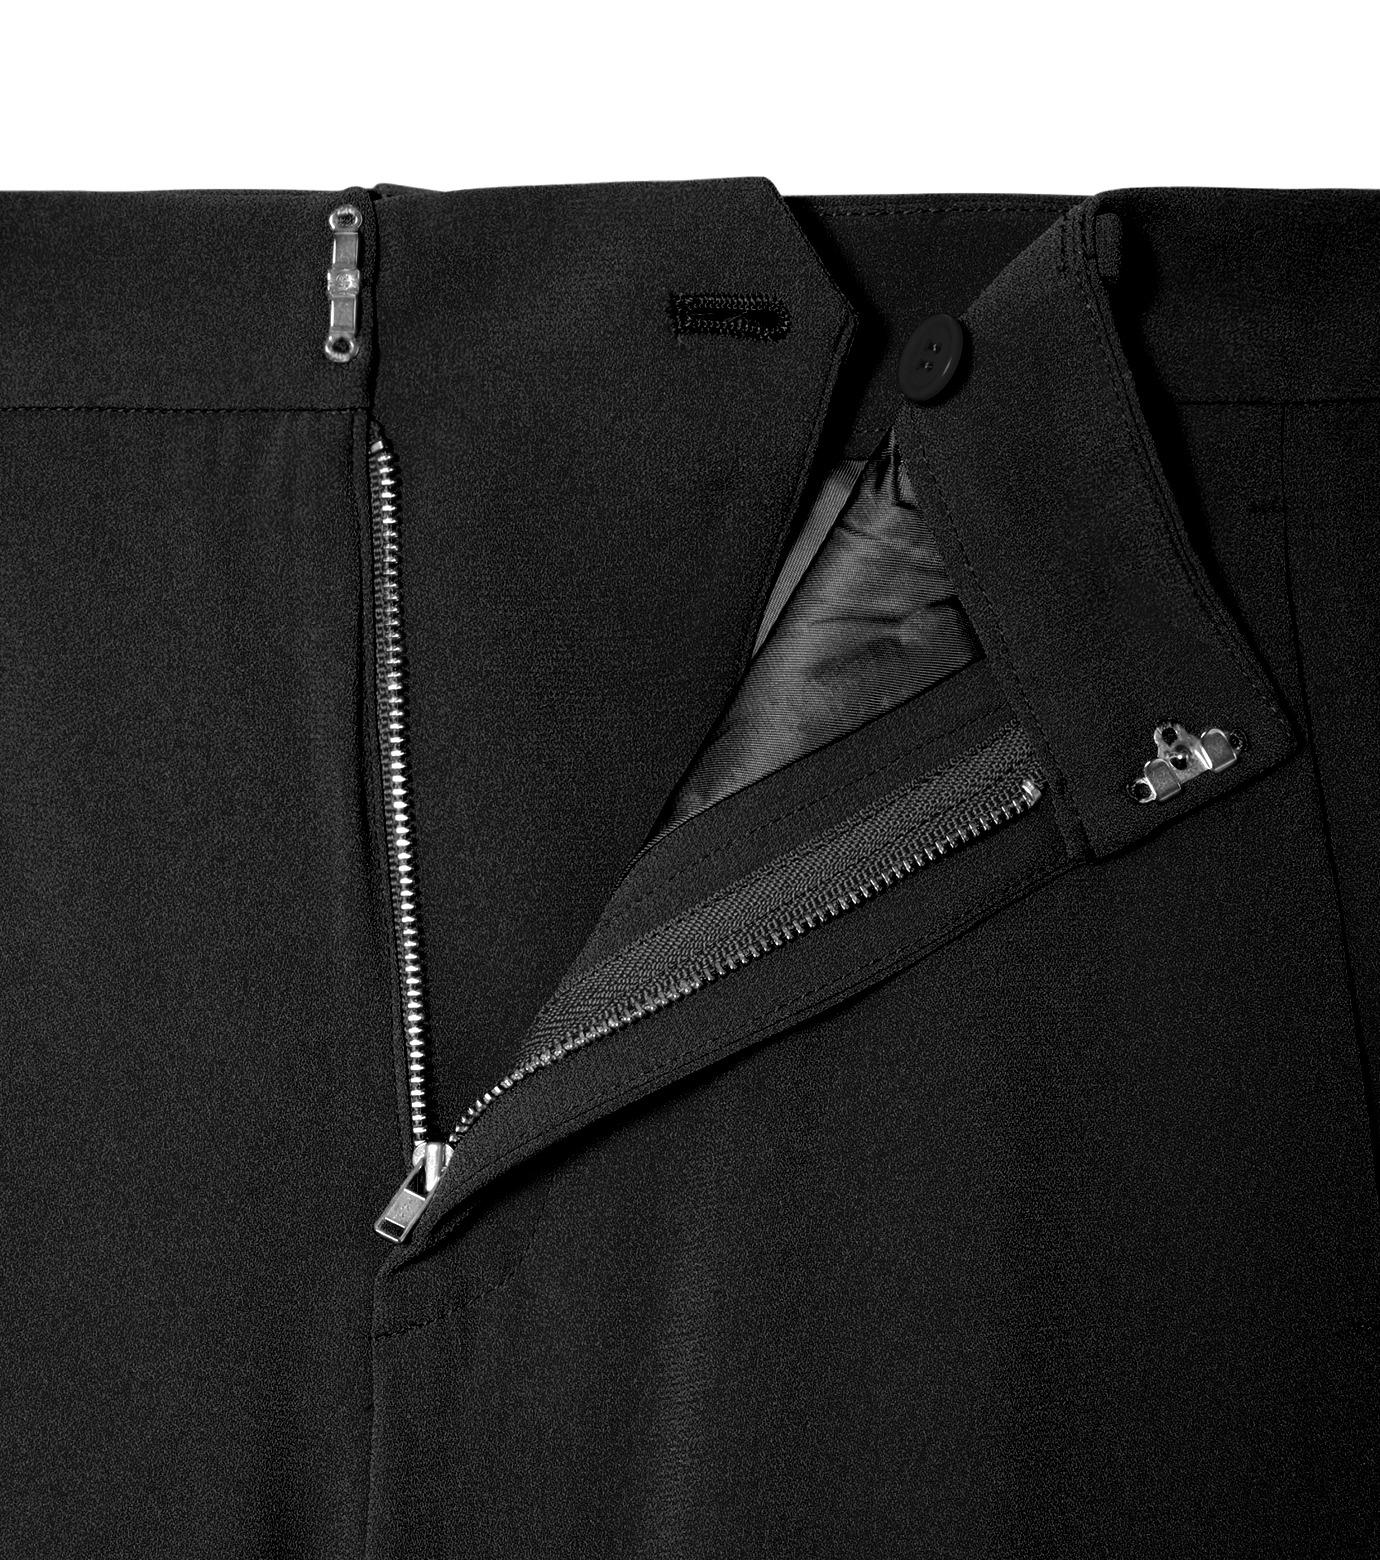 LE CIEL BLEU(ルシェルブルー)のトラックワイドパンツ-BLACK(パンツ/pants)-19S68103 拡大詳細画像5